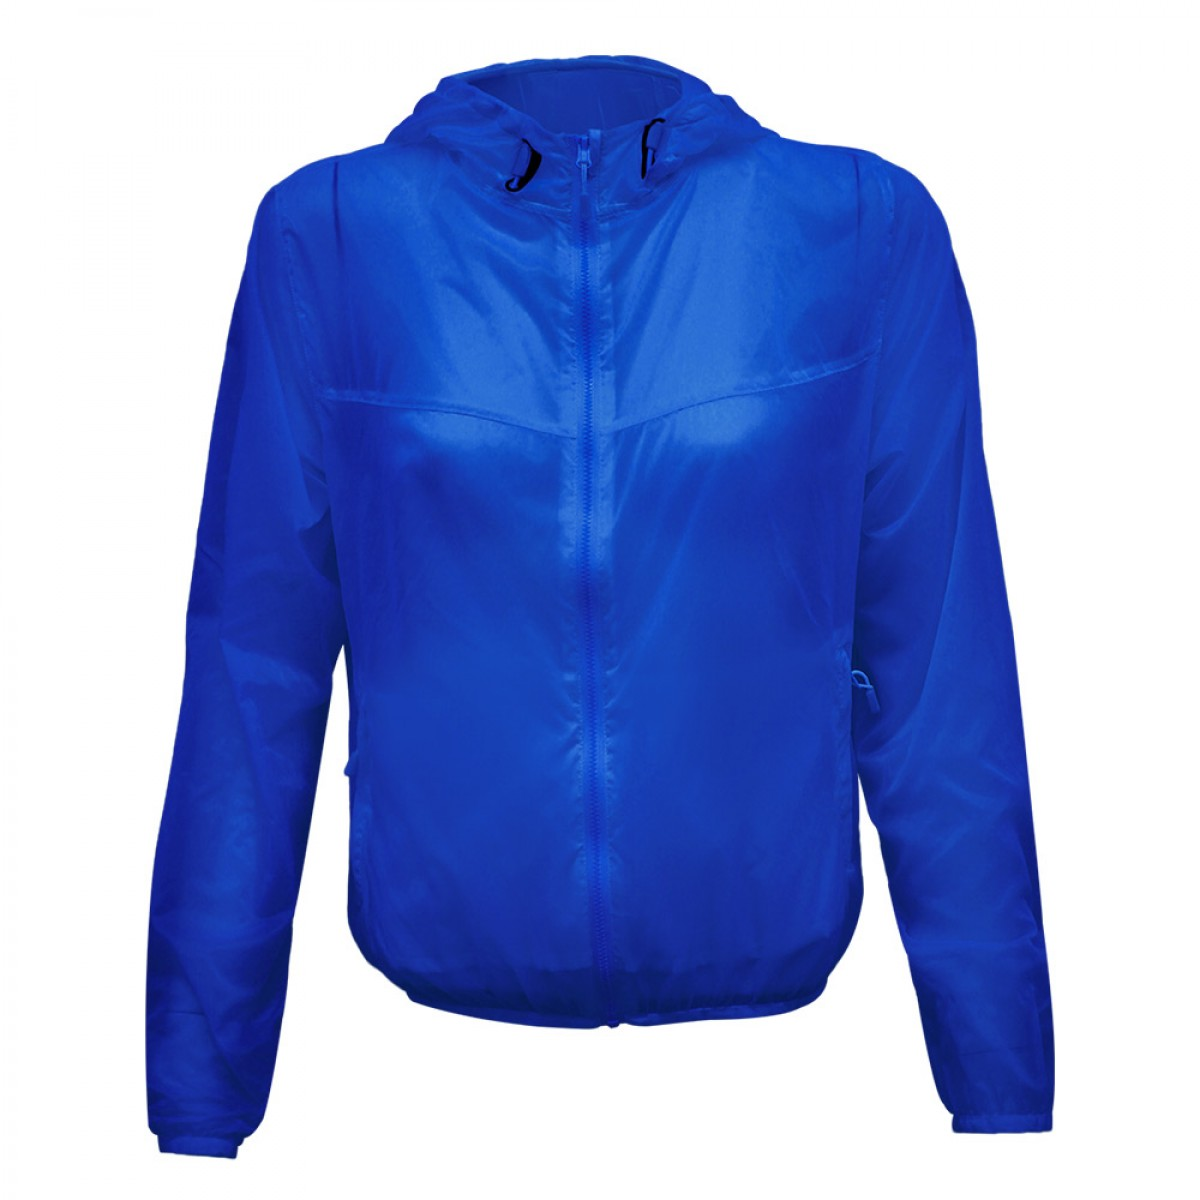 8848-ktm-cty-women-transparent-windcheater-jacket-w2kw2j96739-5a